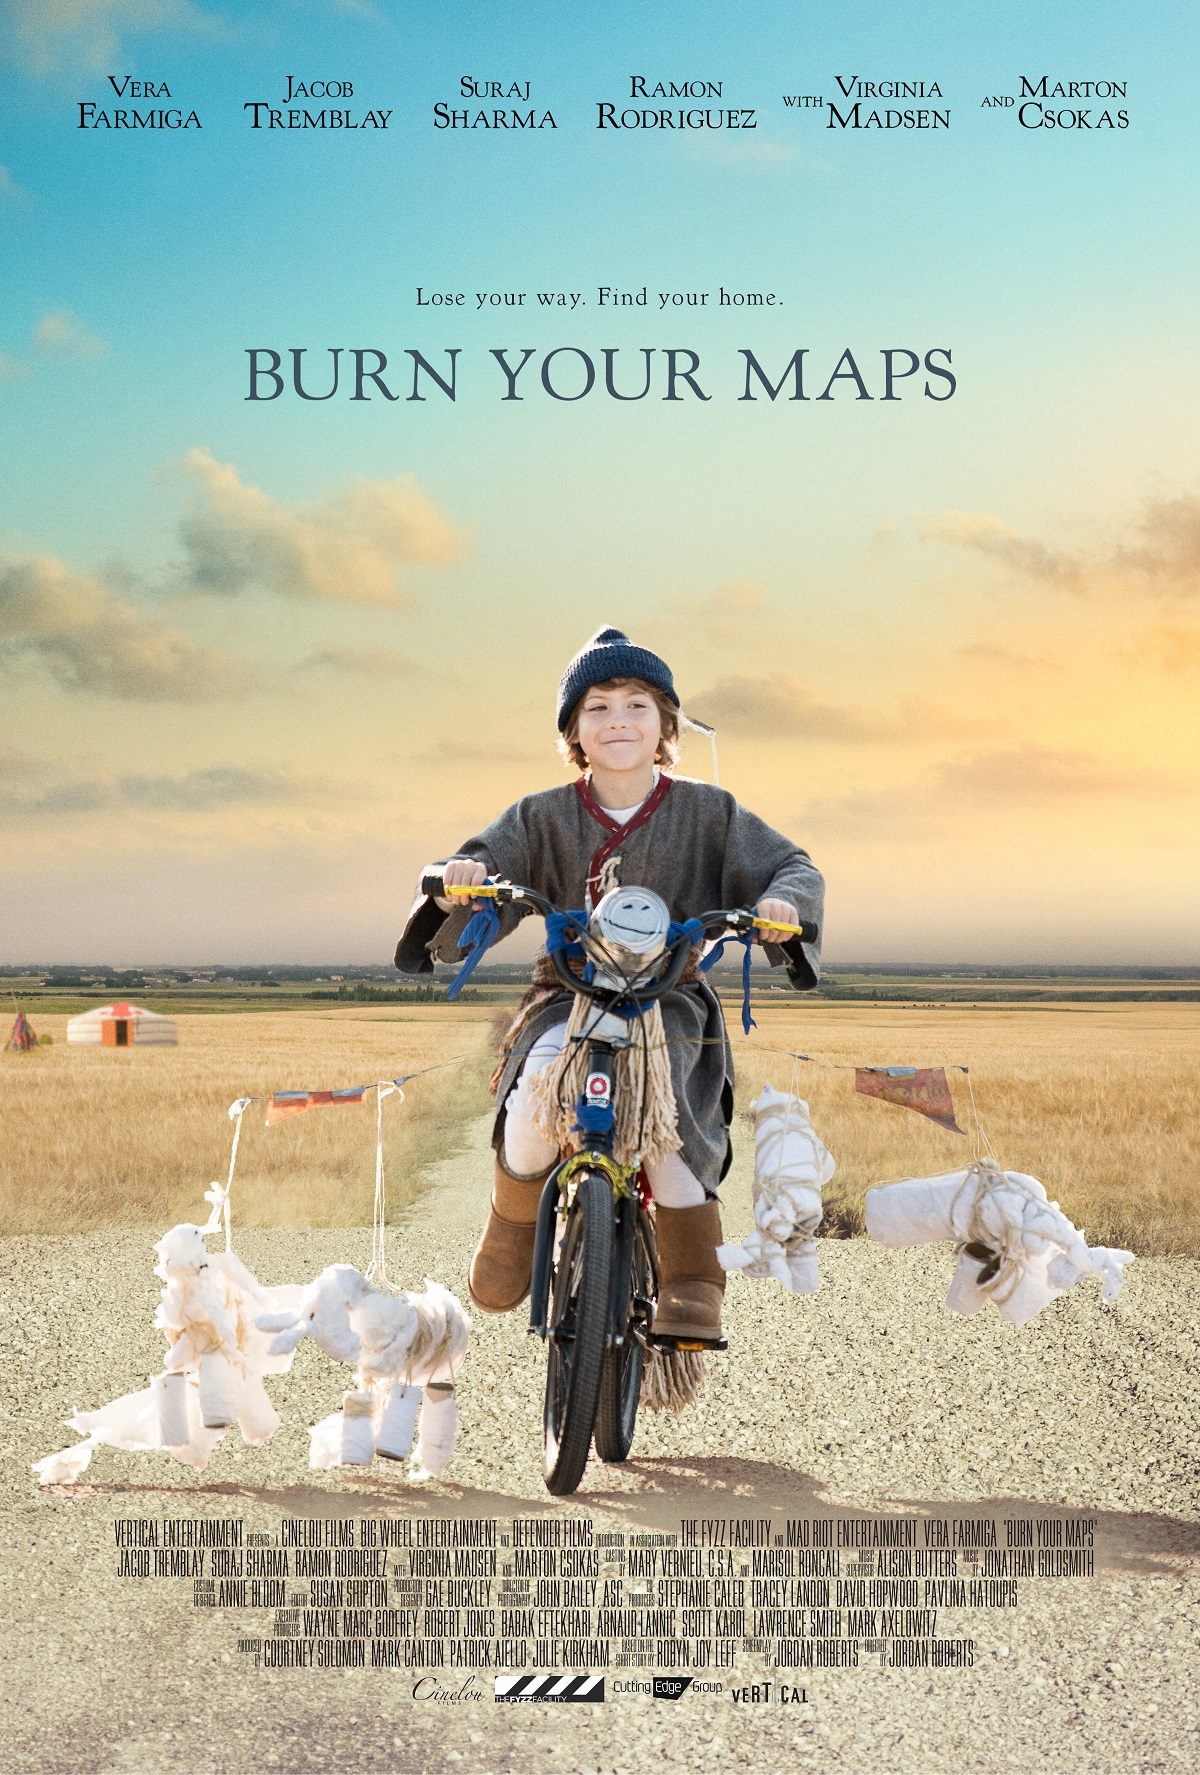 Maps 2016.Burn Your Maps 2016 Imdb